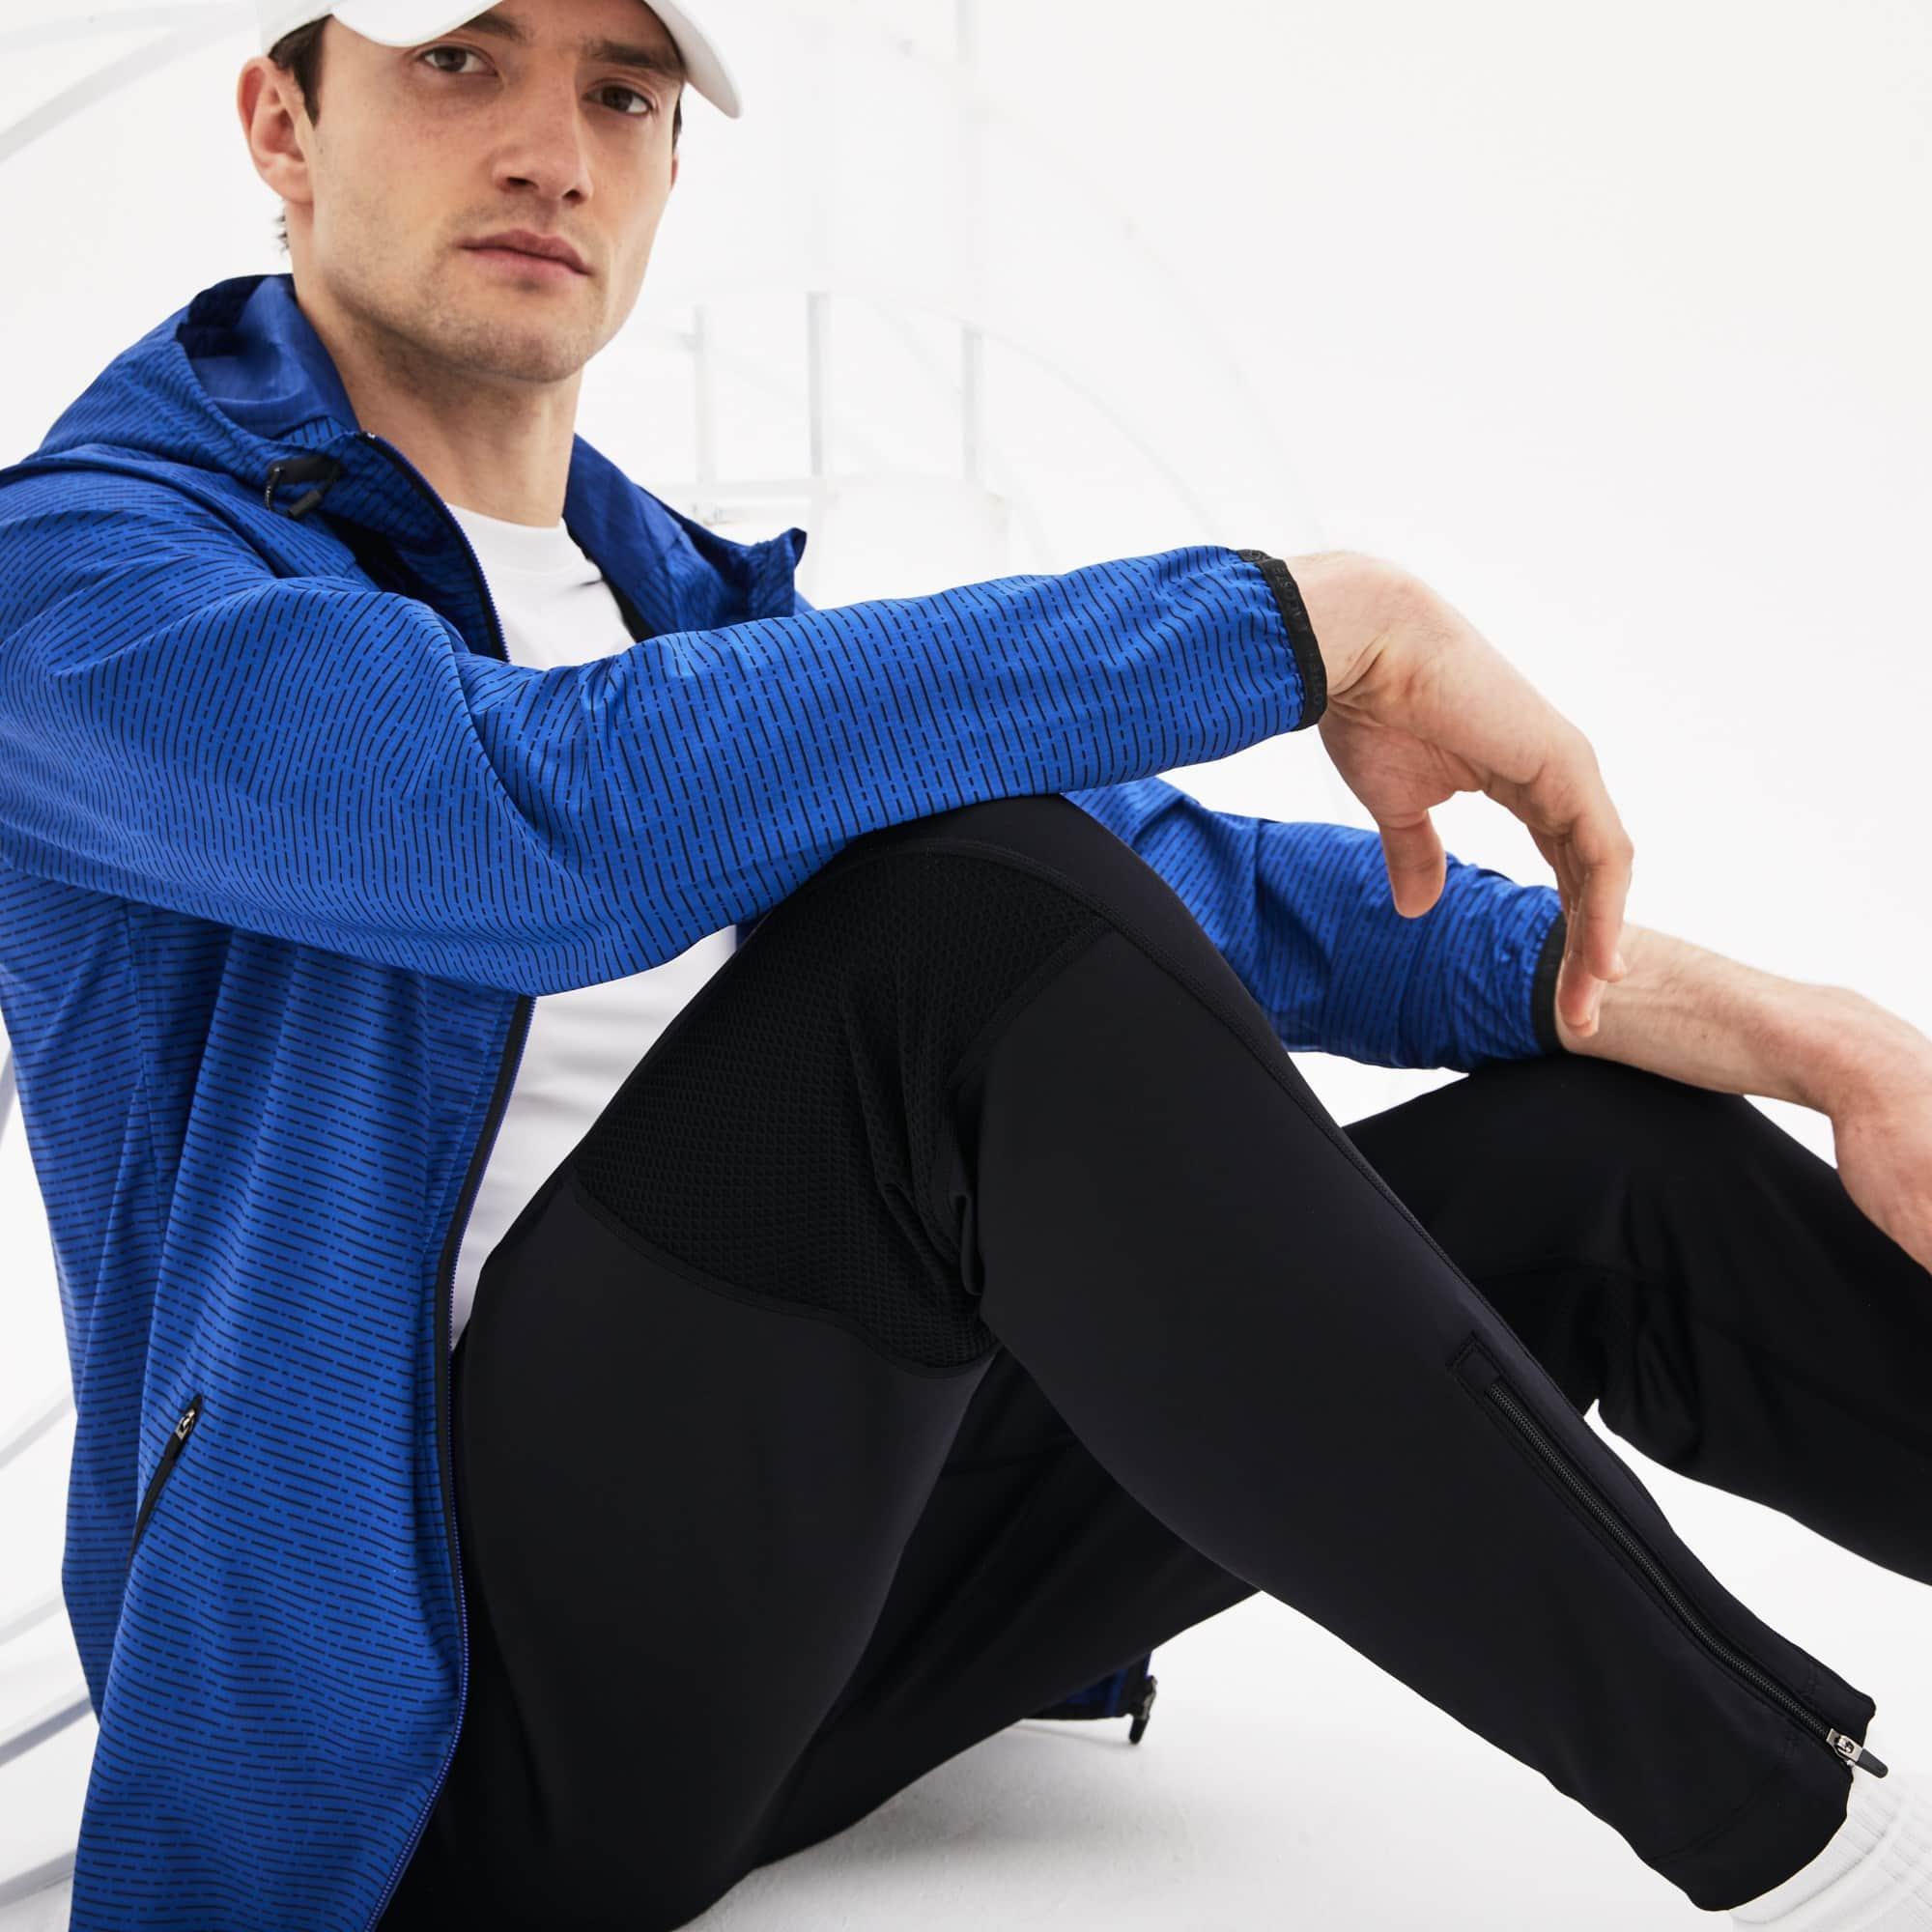 d92b3c01ba3 Collection Novak Djokovic. Pantalon de survêtement Tennis Lacoste SPORT ...